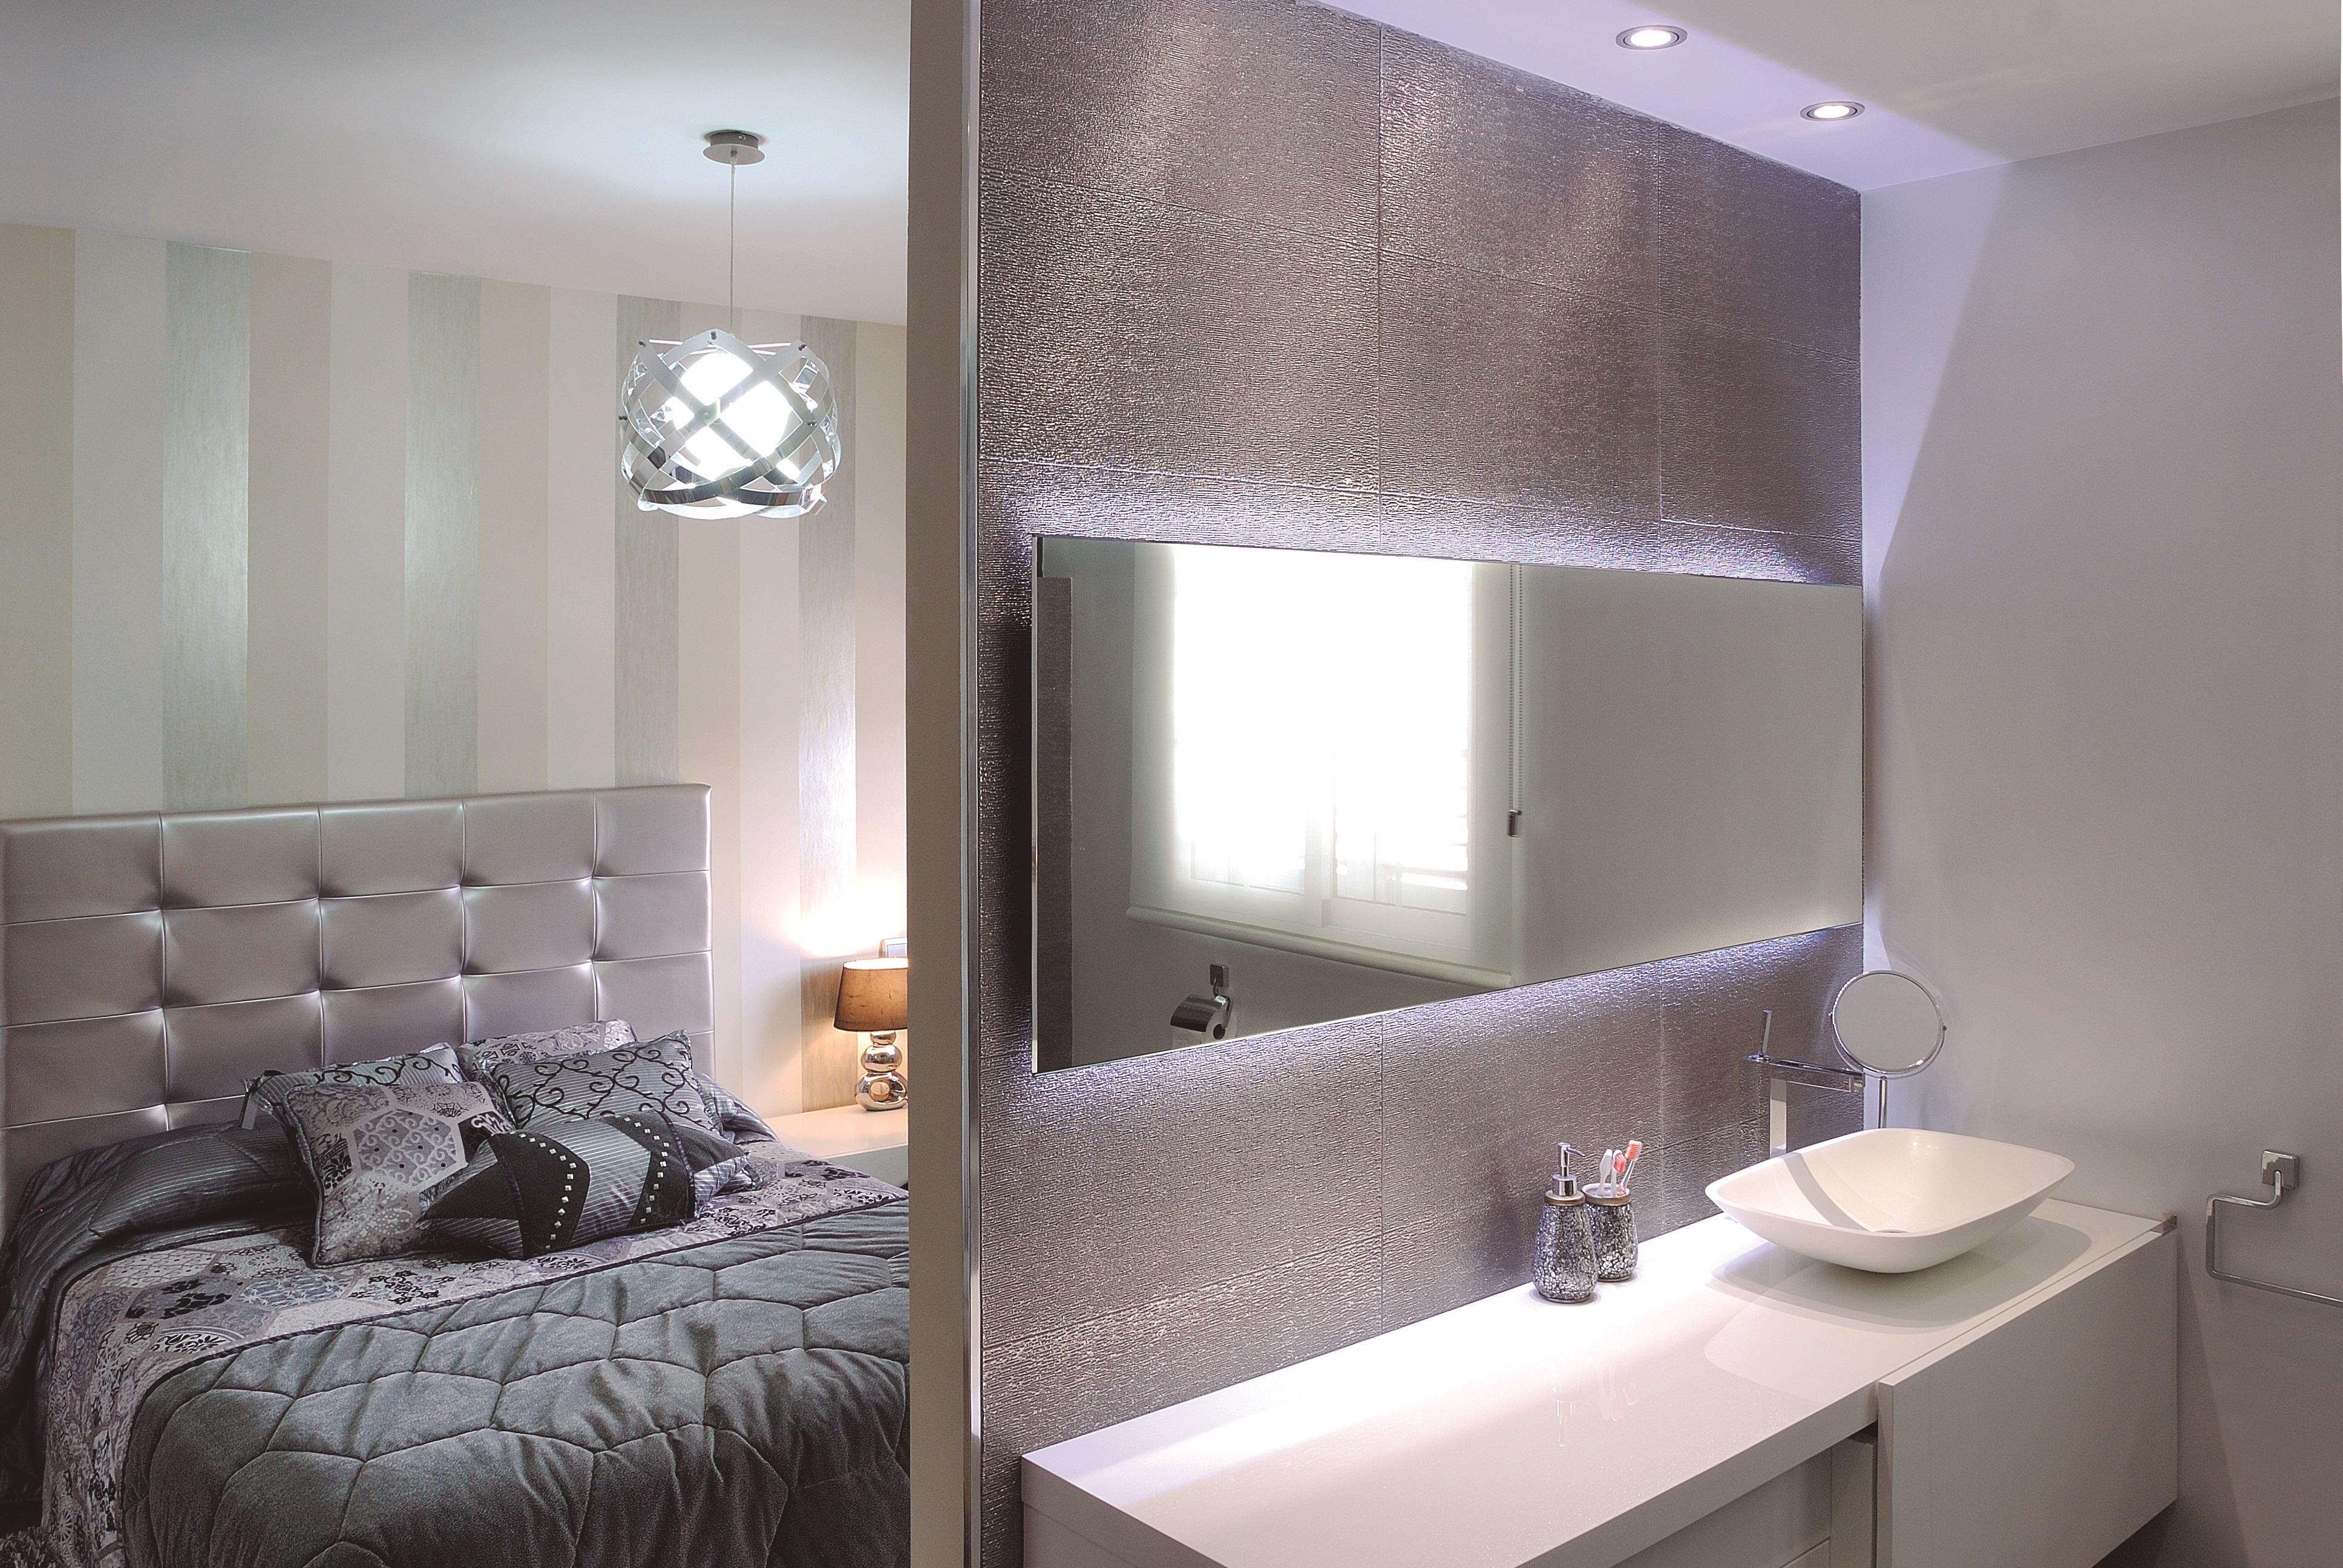 Espejo rect ngular 5 mm con iluminaci n leds marco oculto for Espejos con iluminacion